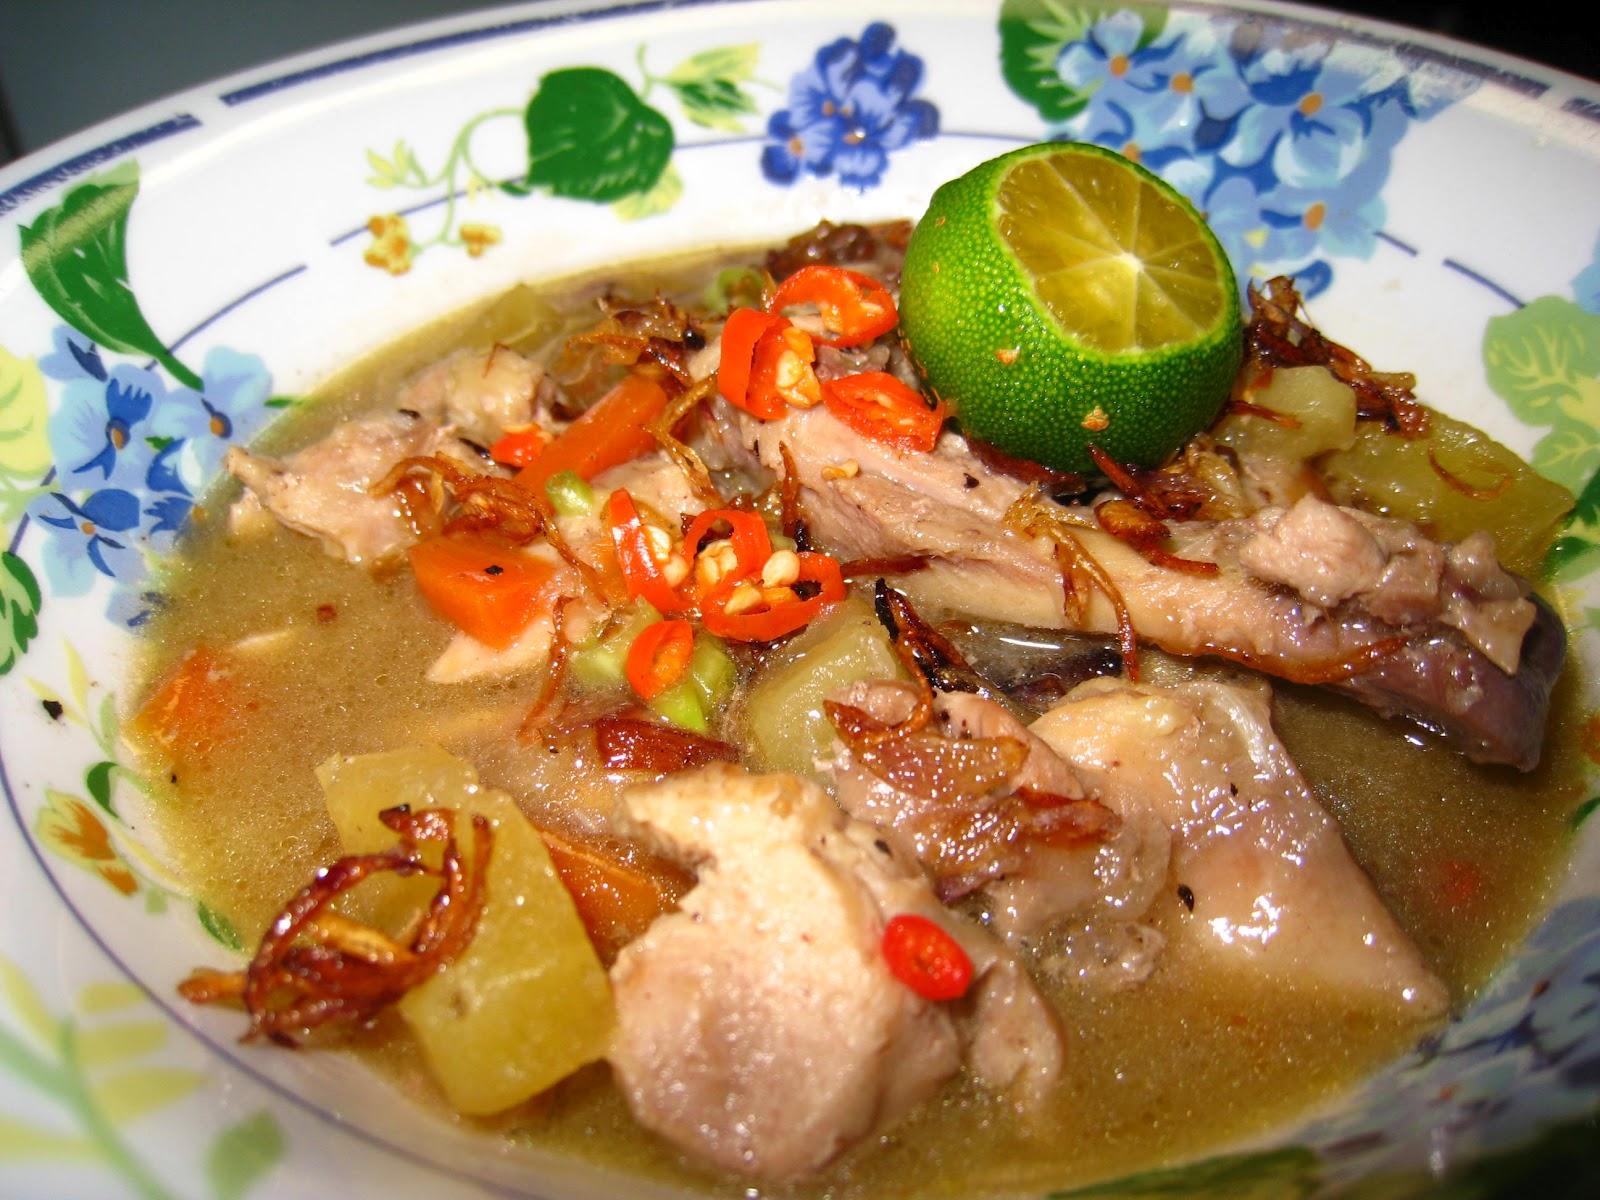 Sup Ayam: Resepi Mudah yang Sedap dan Berkhasiat